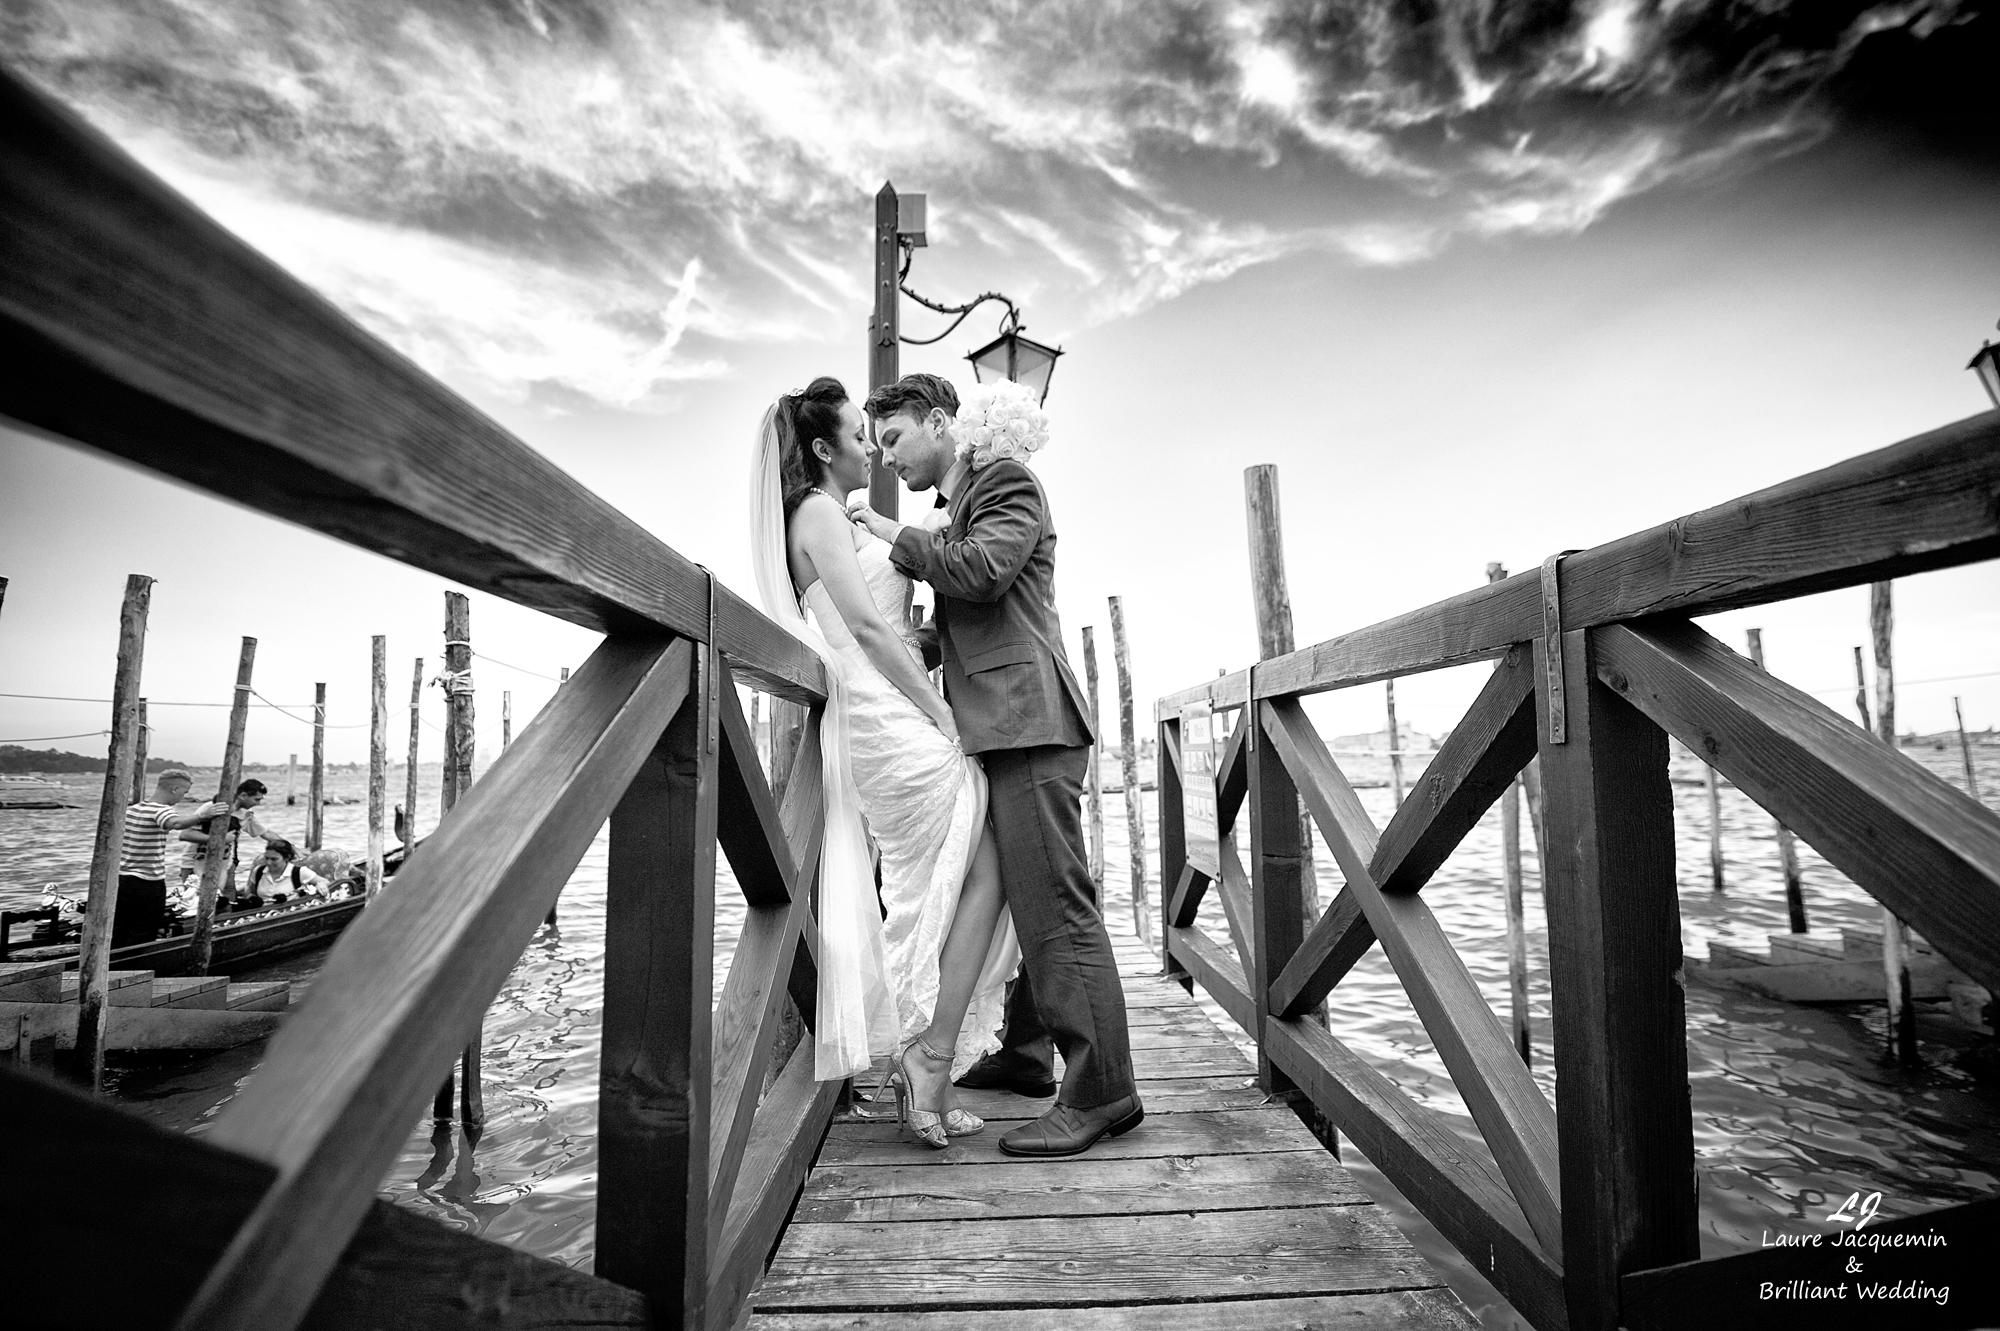 Venice Simbolic Wedding gondola venice Italy laure jacquemin photography (82) copia